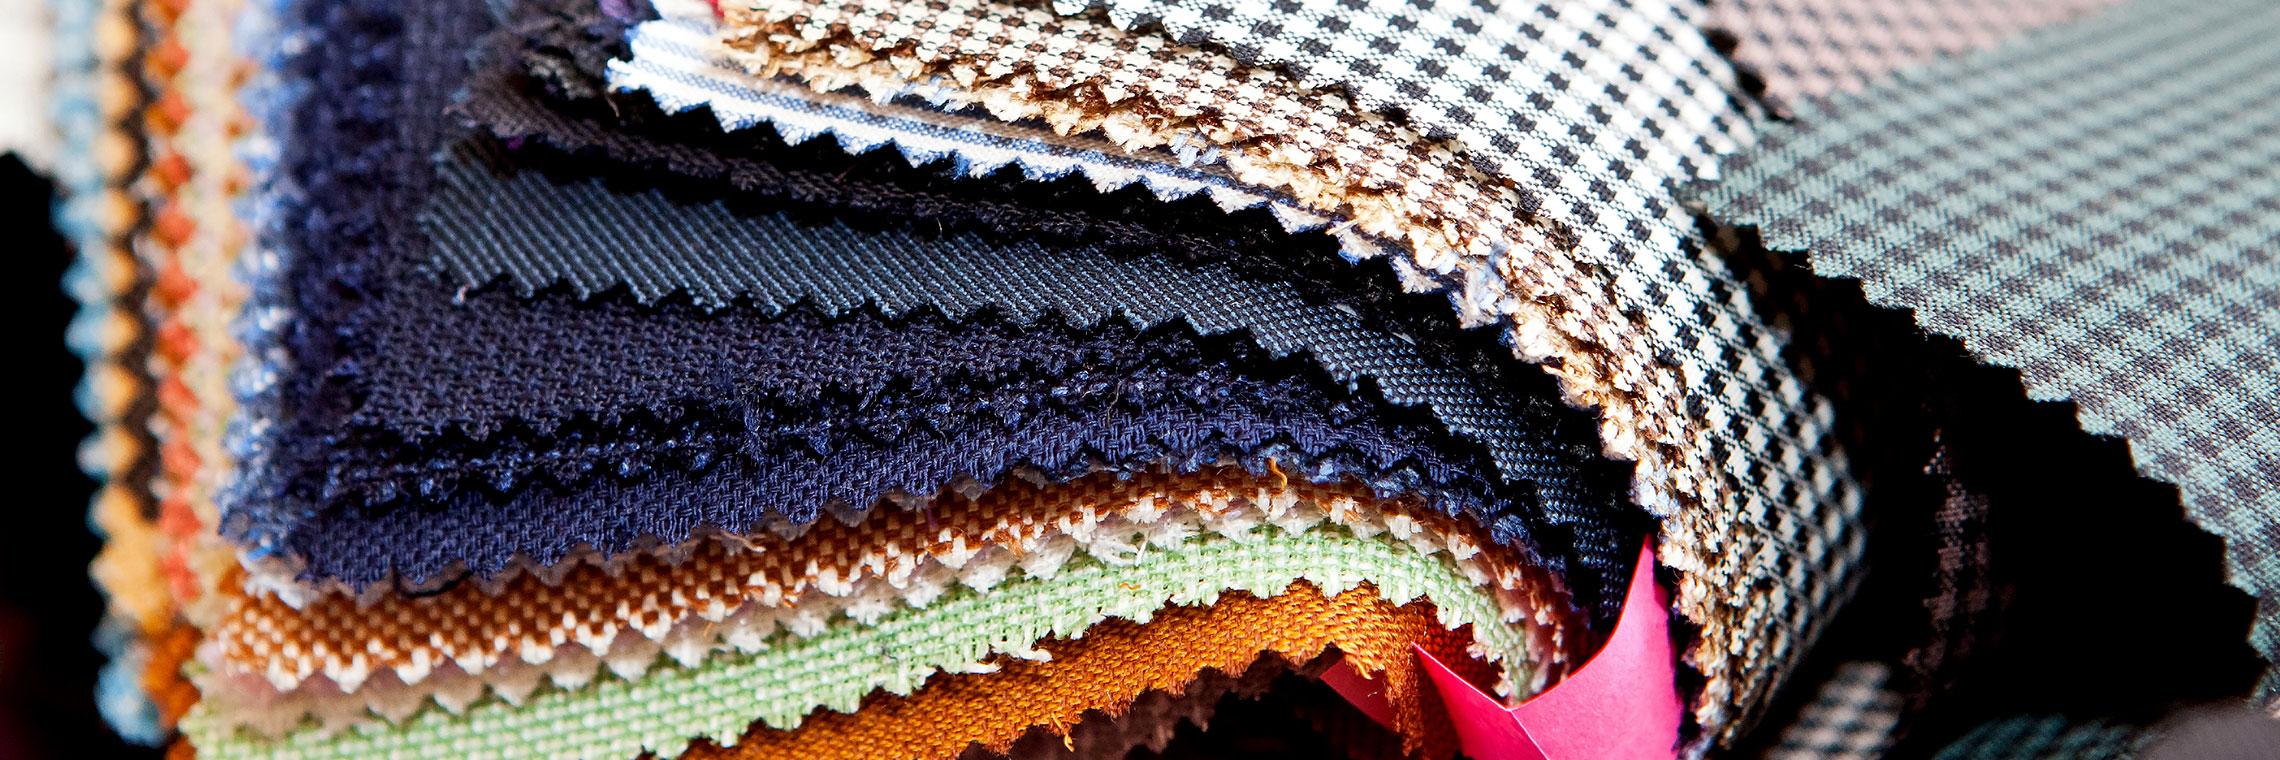 Fabric-pile-large-Maggie-Beal-harker-and-bullman-Wimborne-dorset-letting-agents-ARLA-meet-the-team